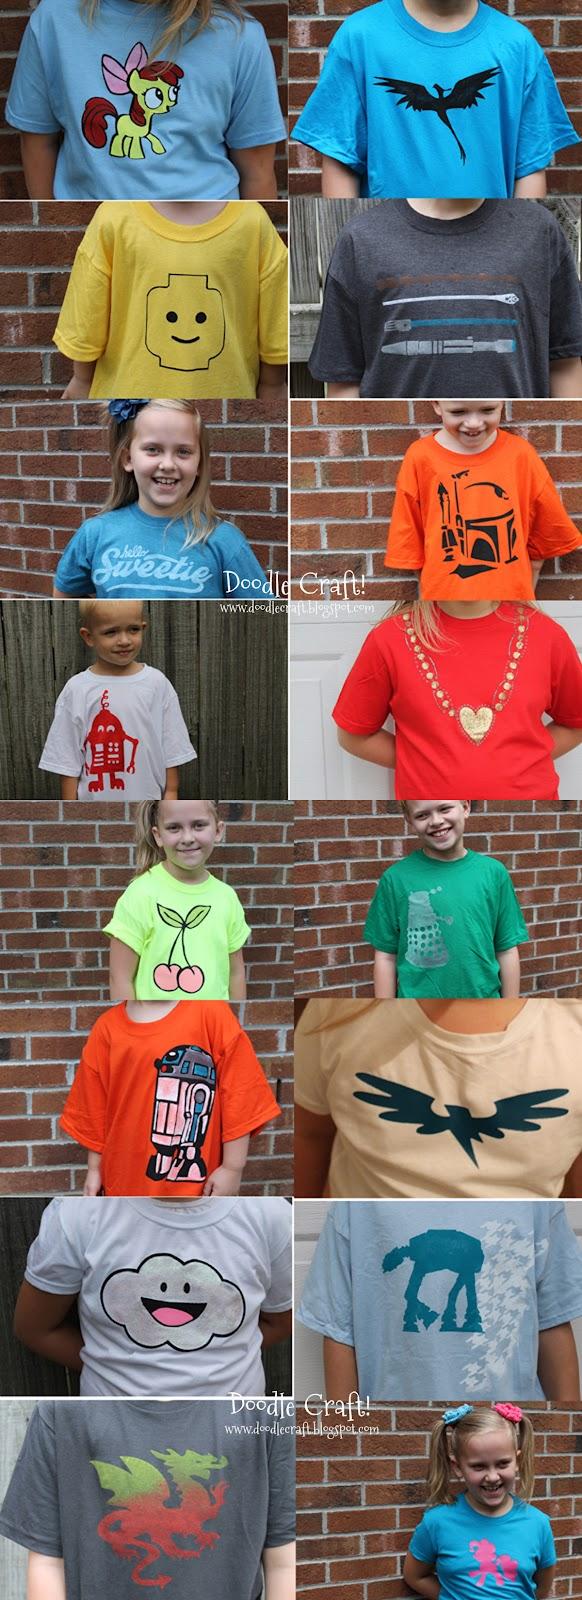 http://www.doodlecraftblog.com/2012/09/back-to-school-wardrobe-on-budget.html